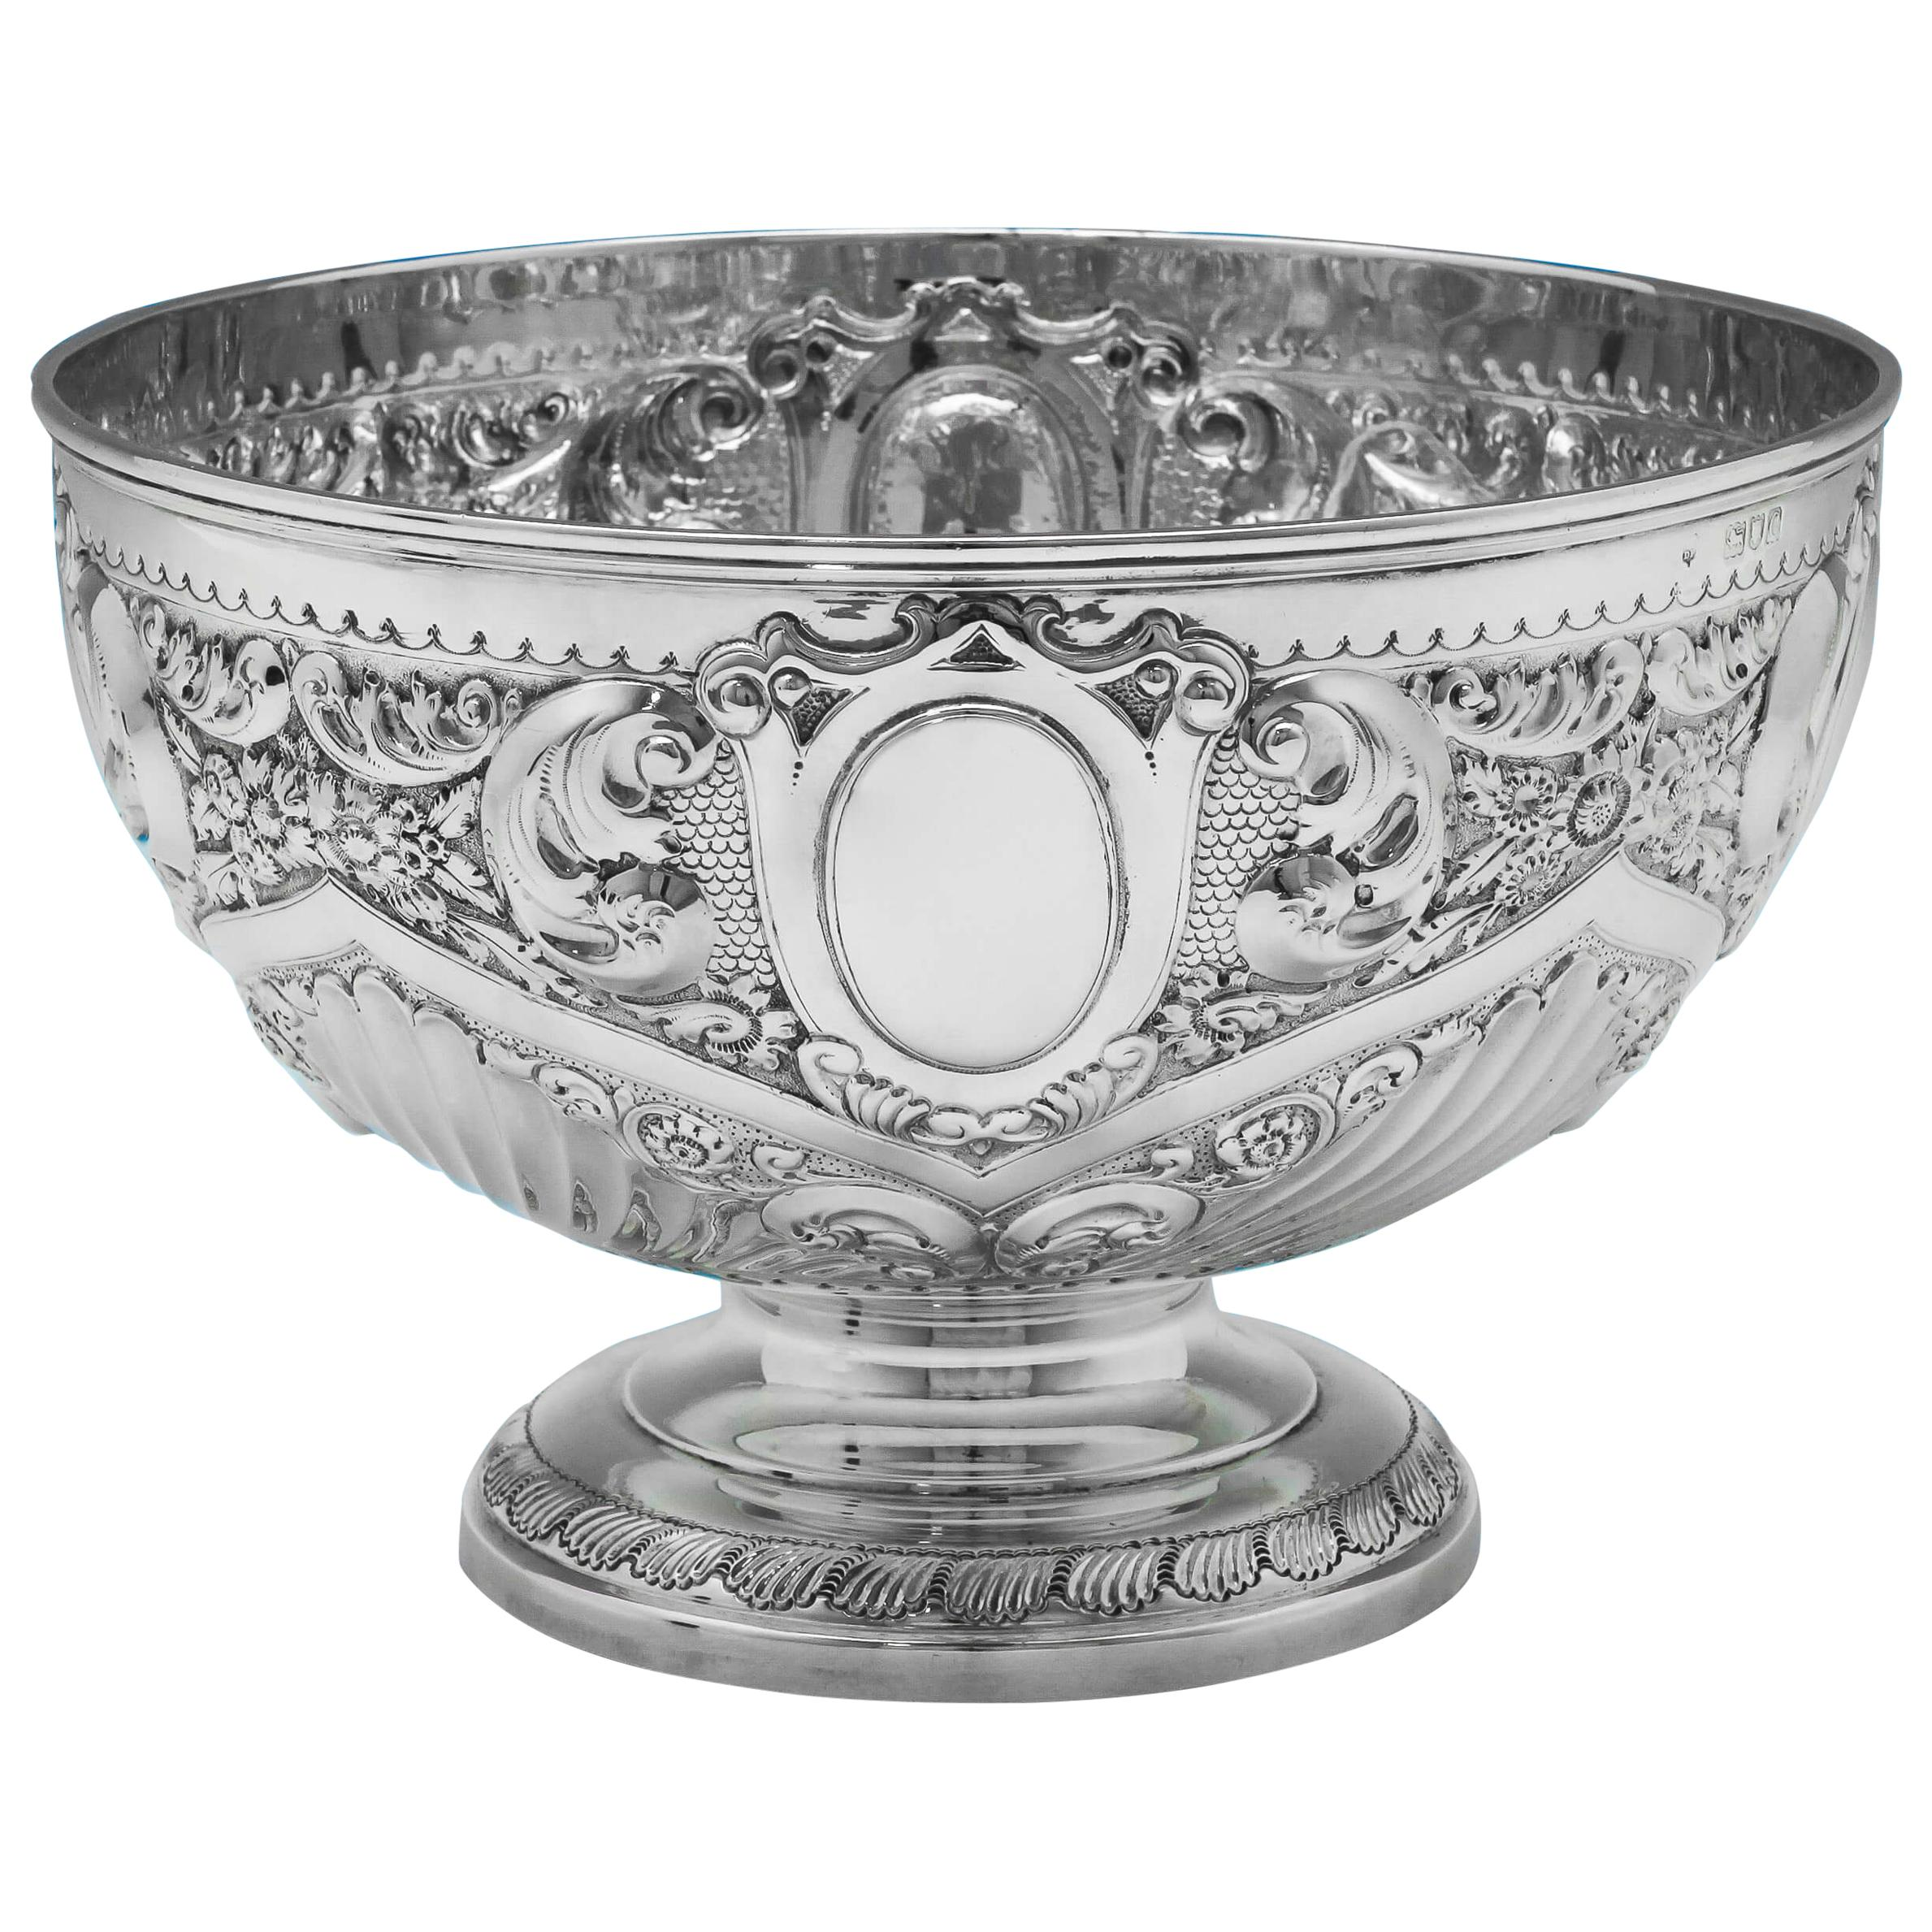 19th Century Victorian Sterling Silver Bowl Hallmarked in 1898